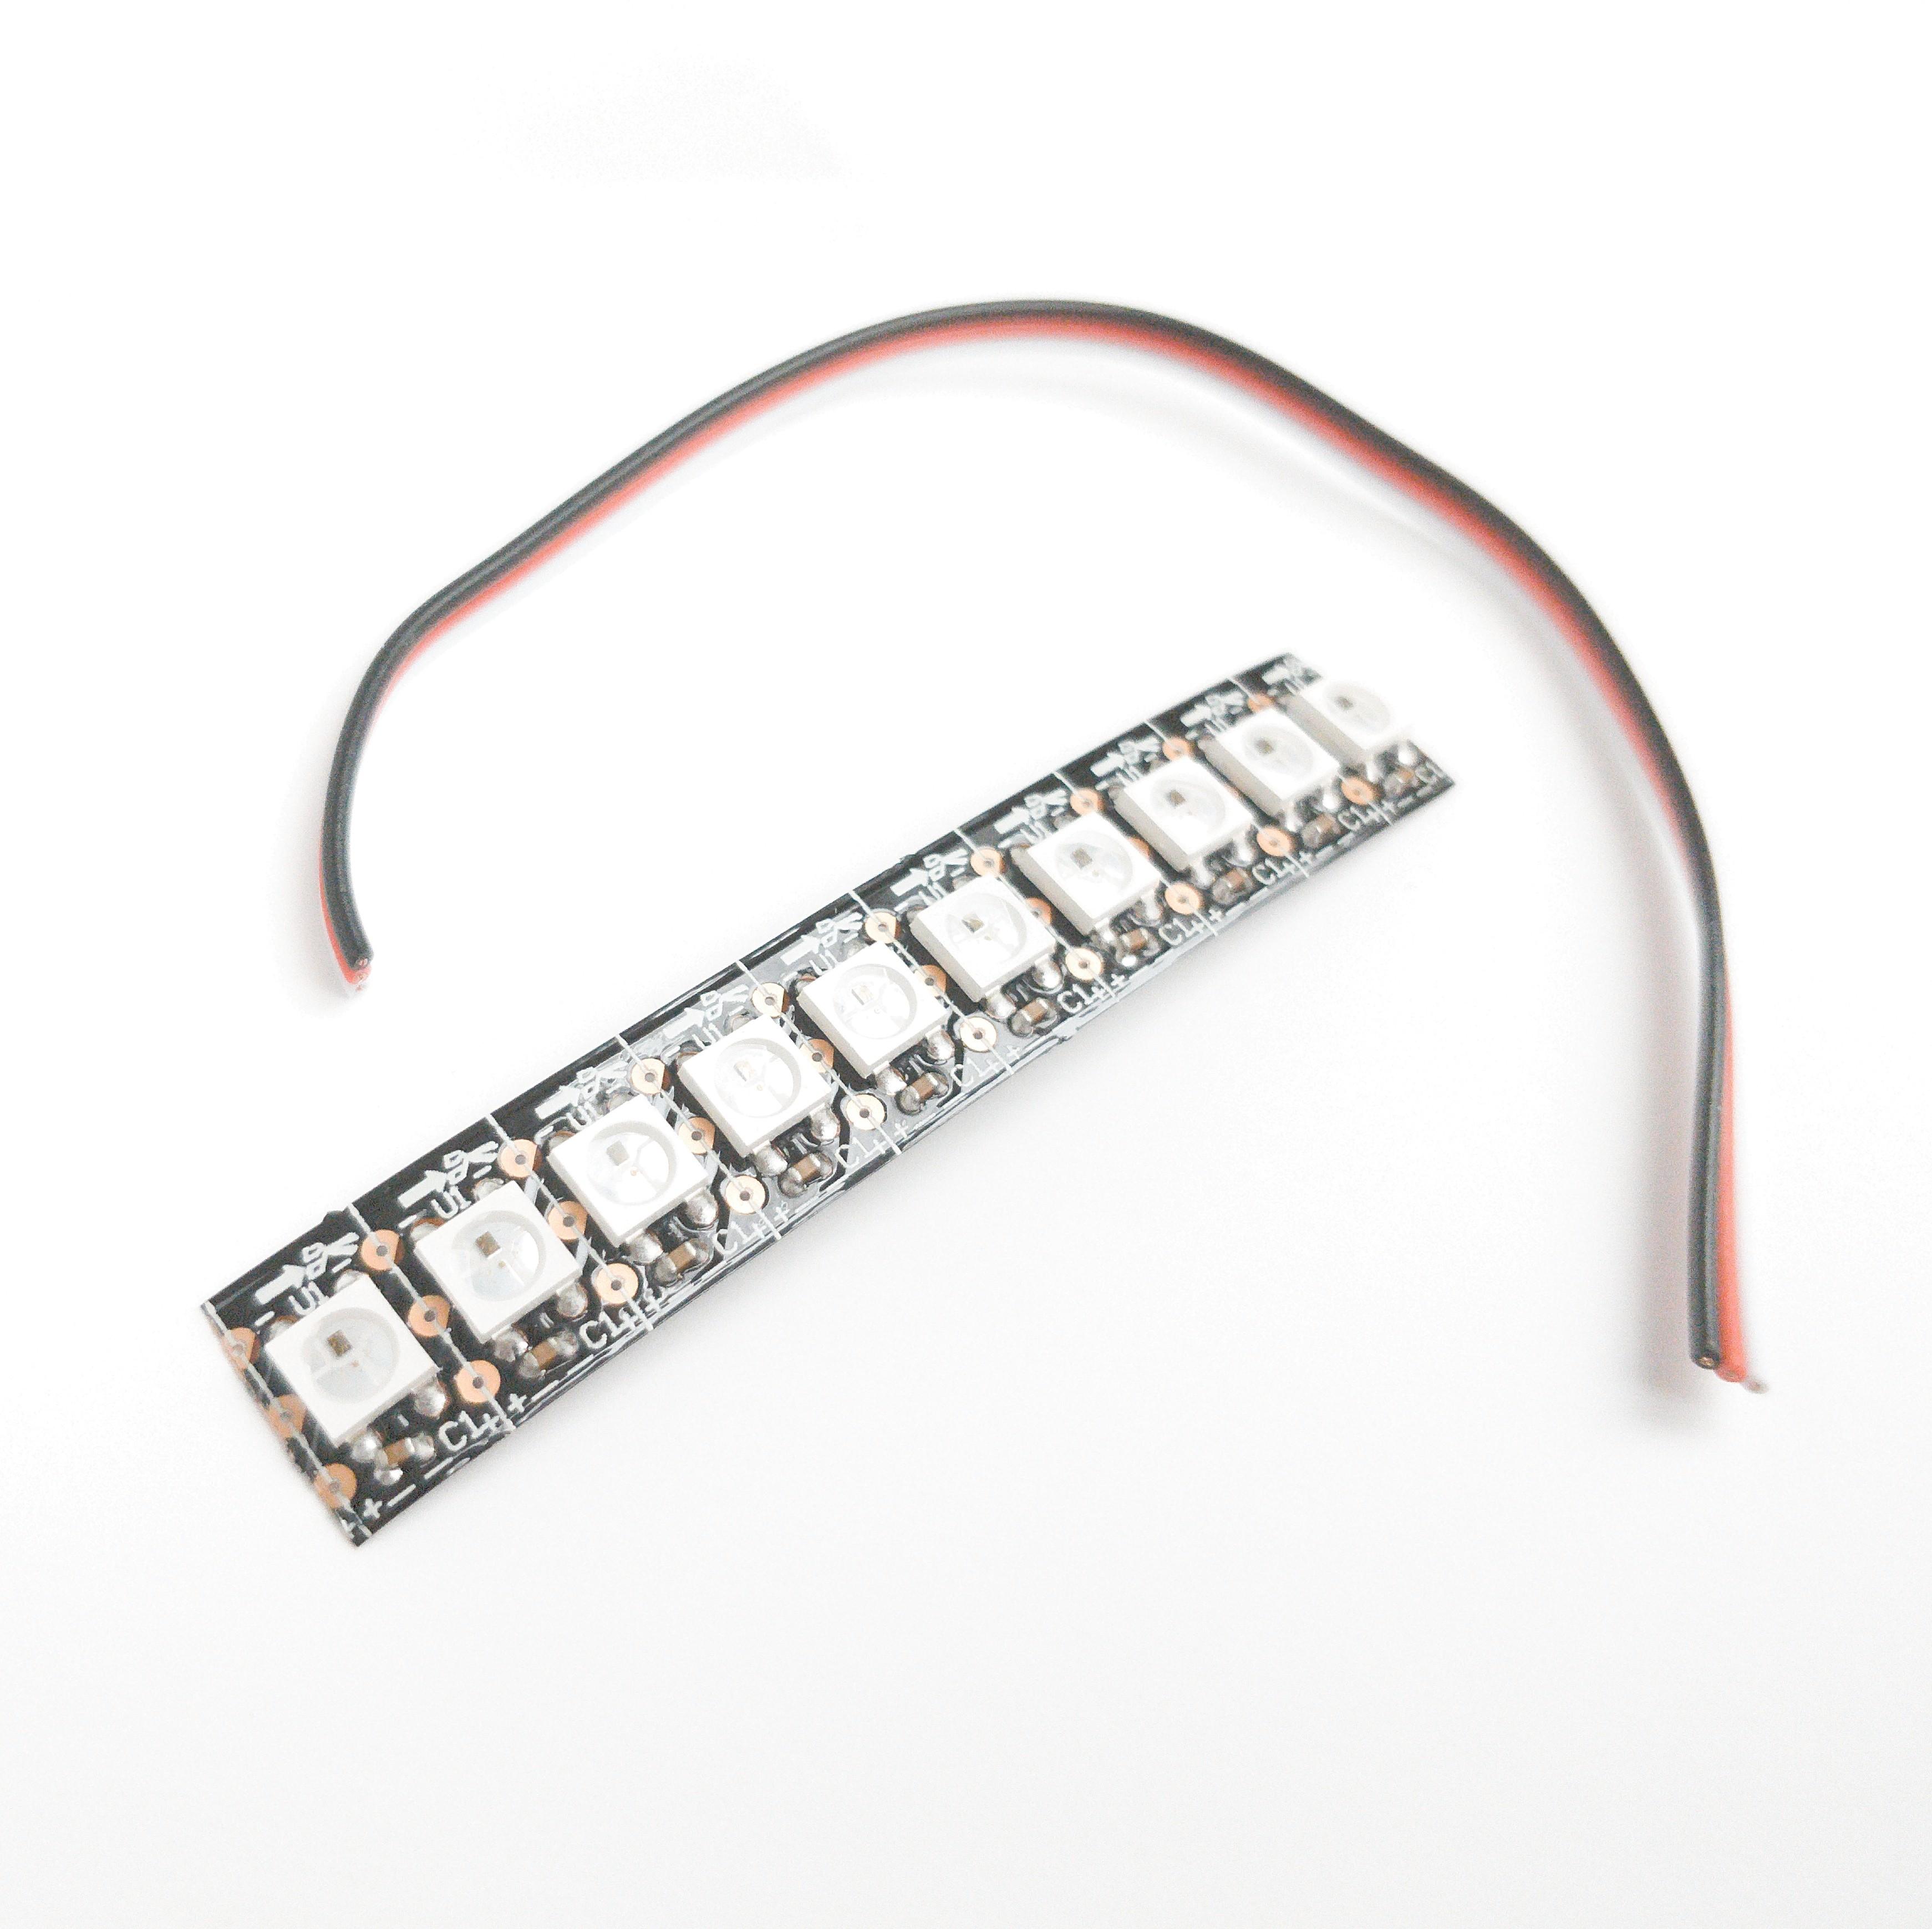 Generic addressable smart RGB LED strip WS2812B 144/m